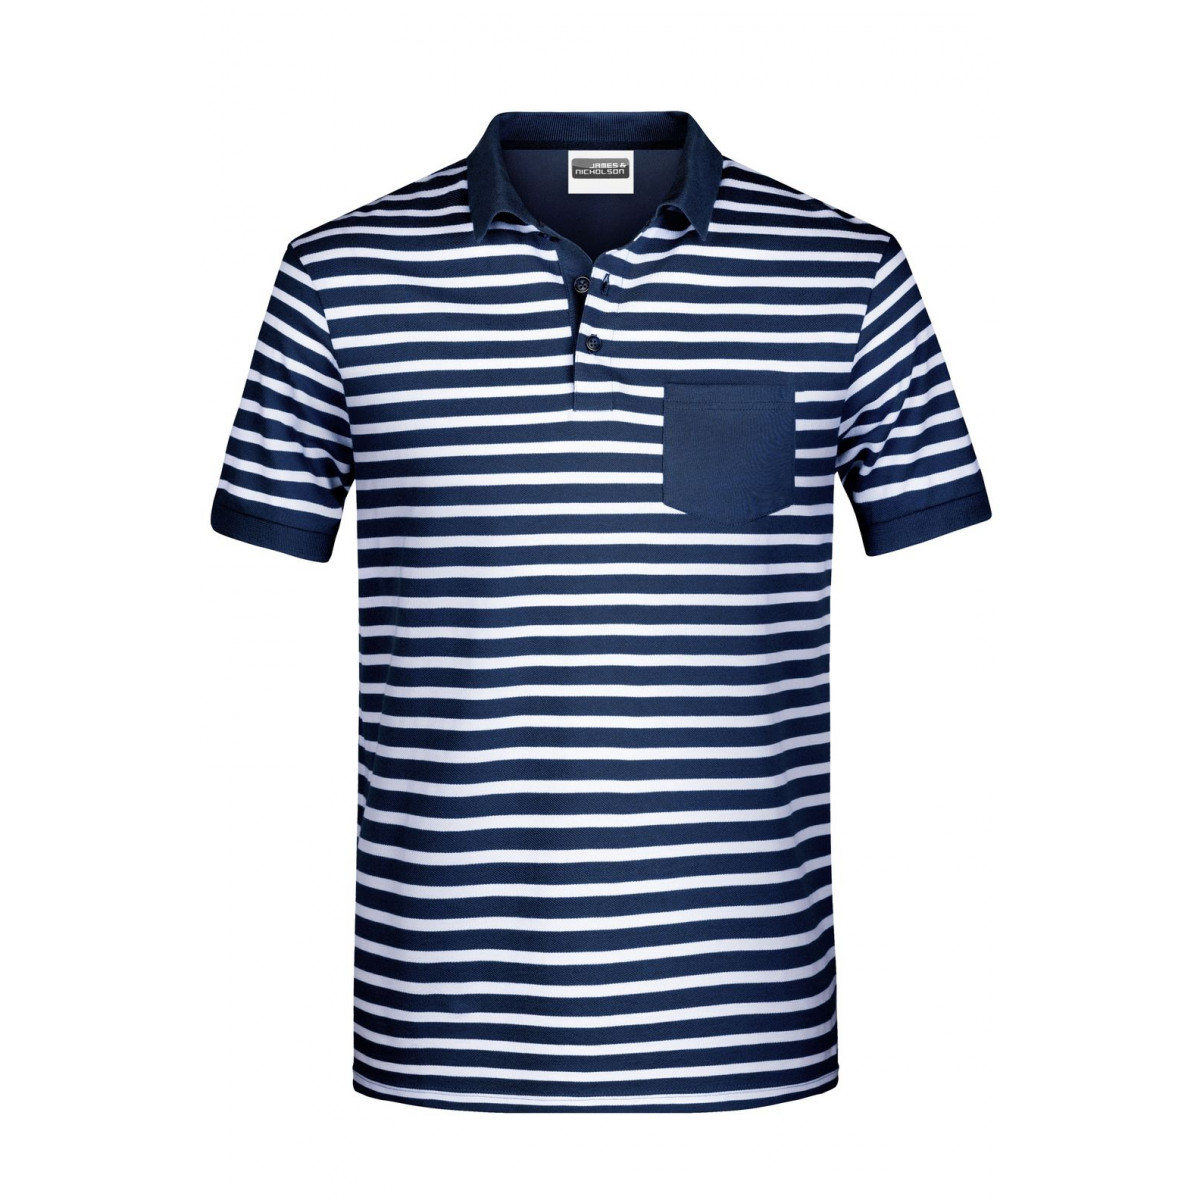 Рубашка поло мужская 8030 Mens Polo Striped - Темно-синий/Белый